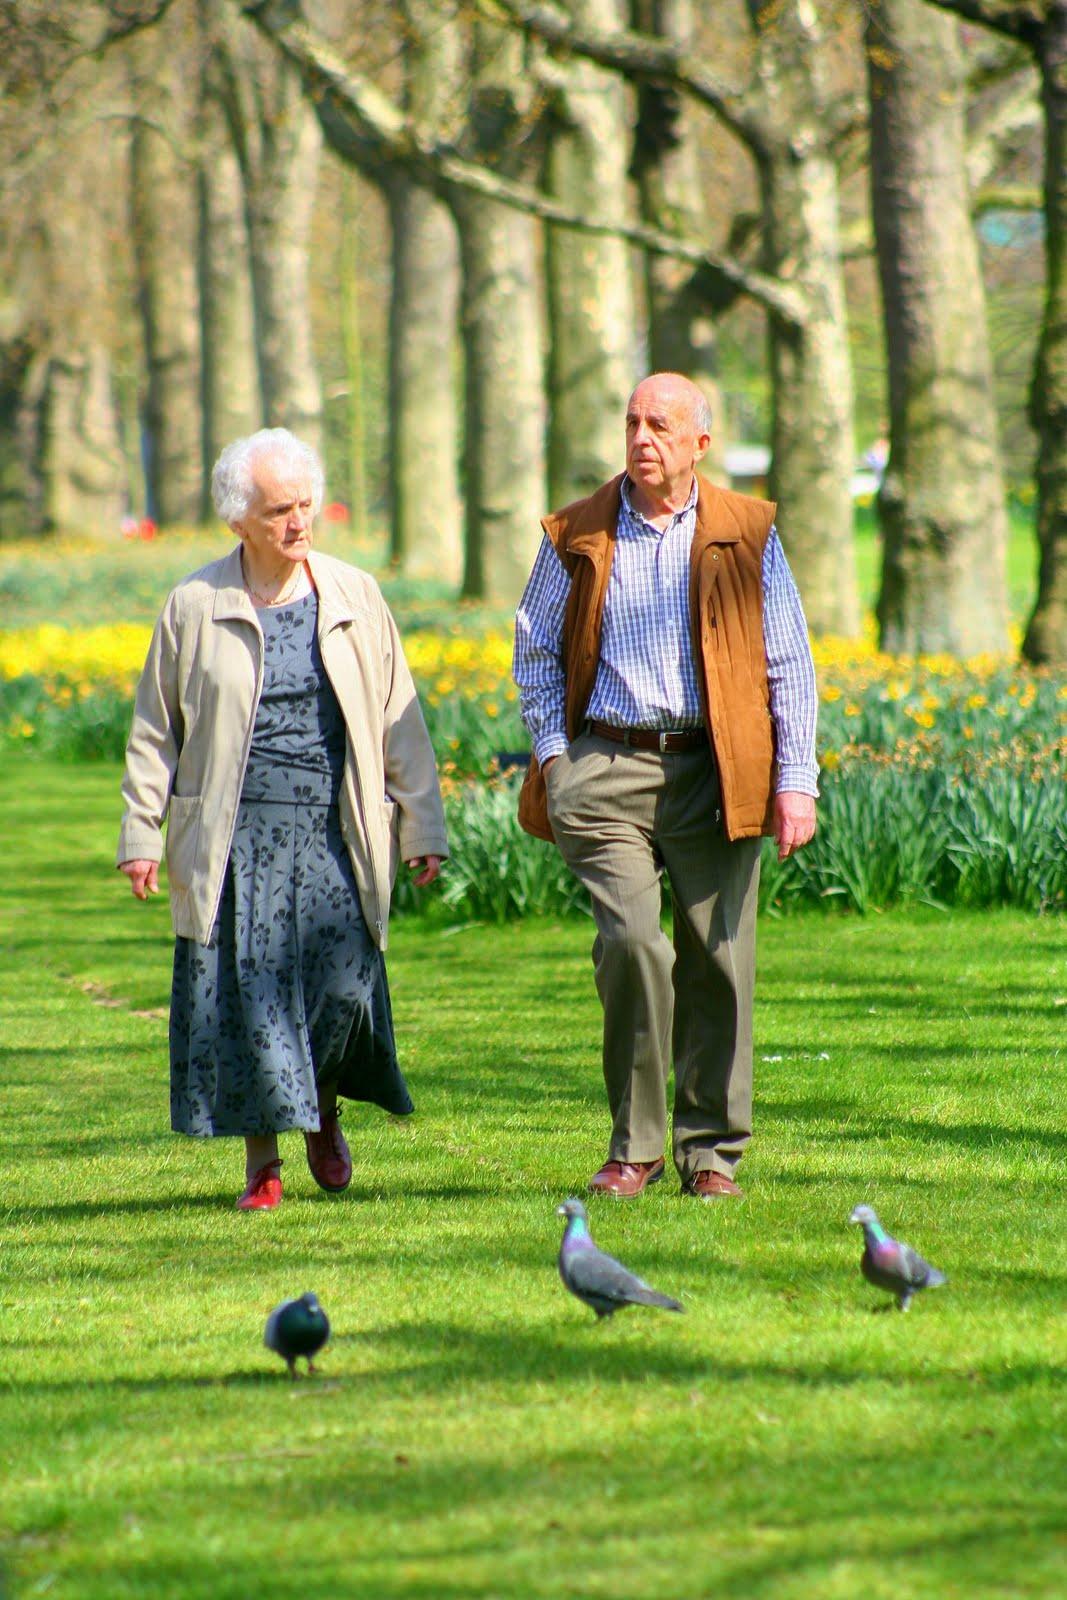 Šetnja i zdravlje starijih osoba